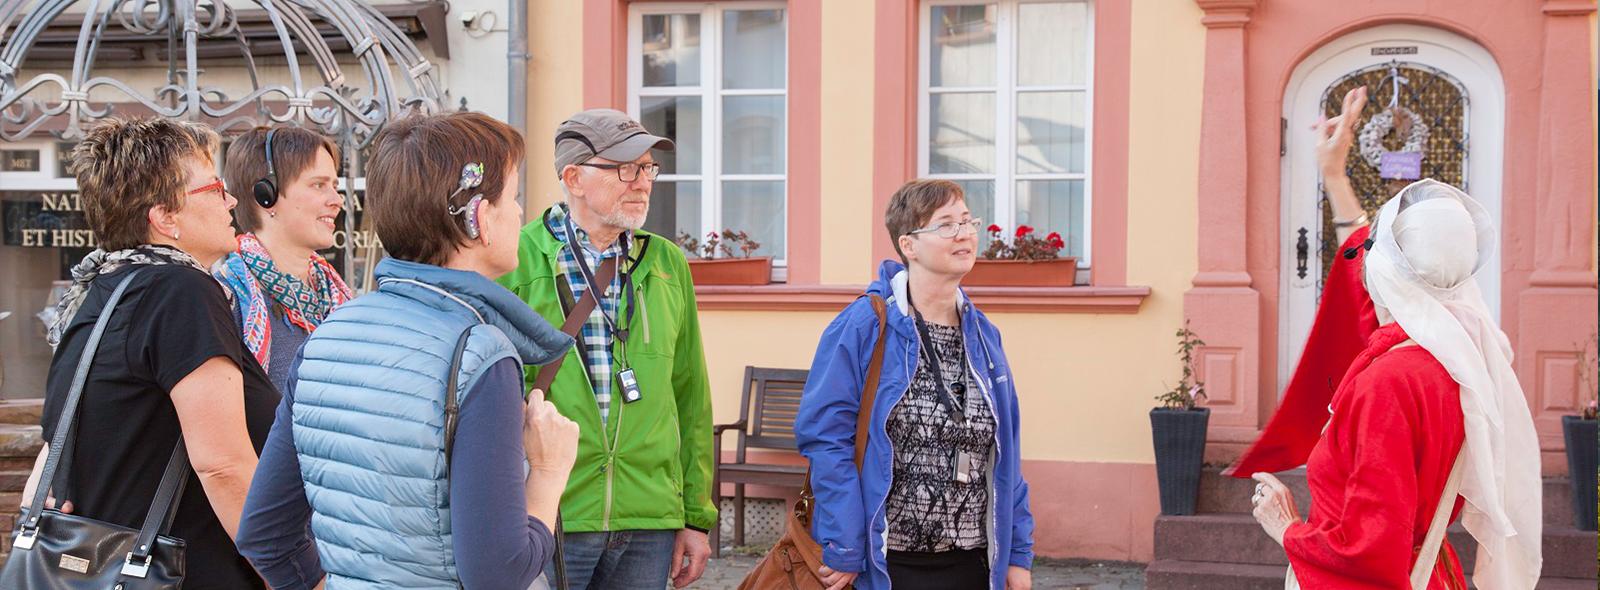 Stadtführung Ottweiler